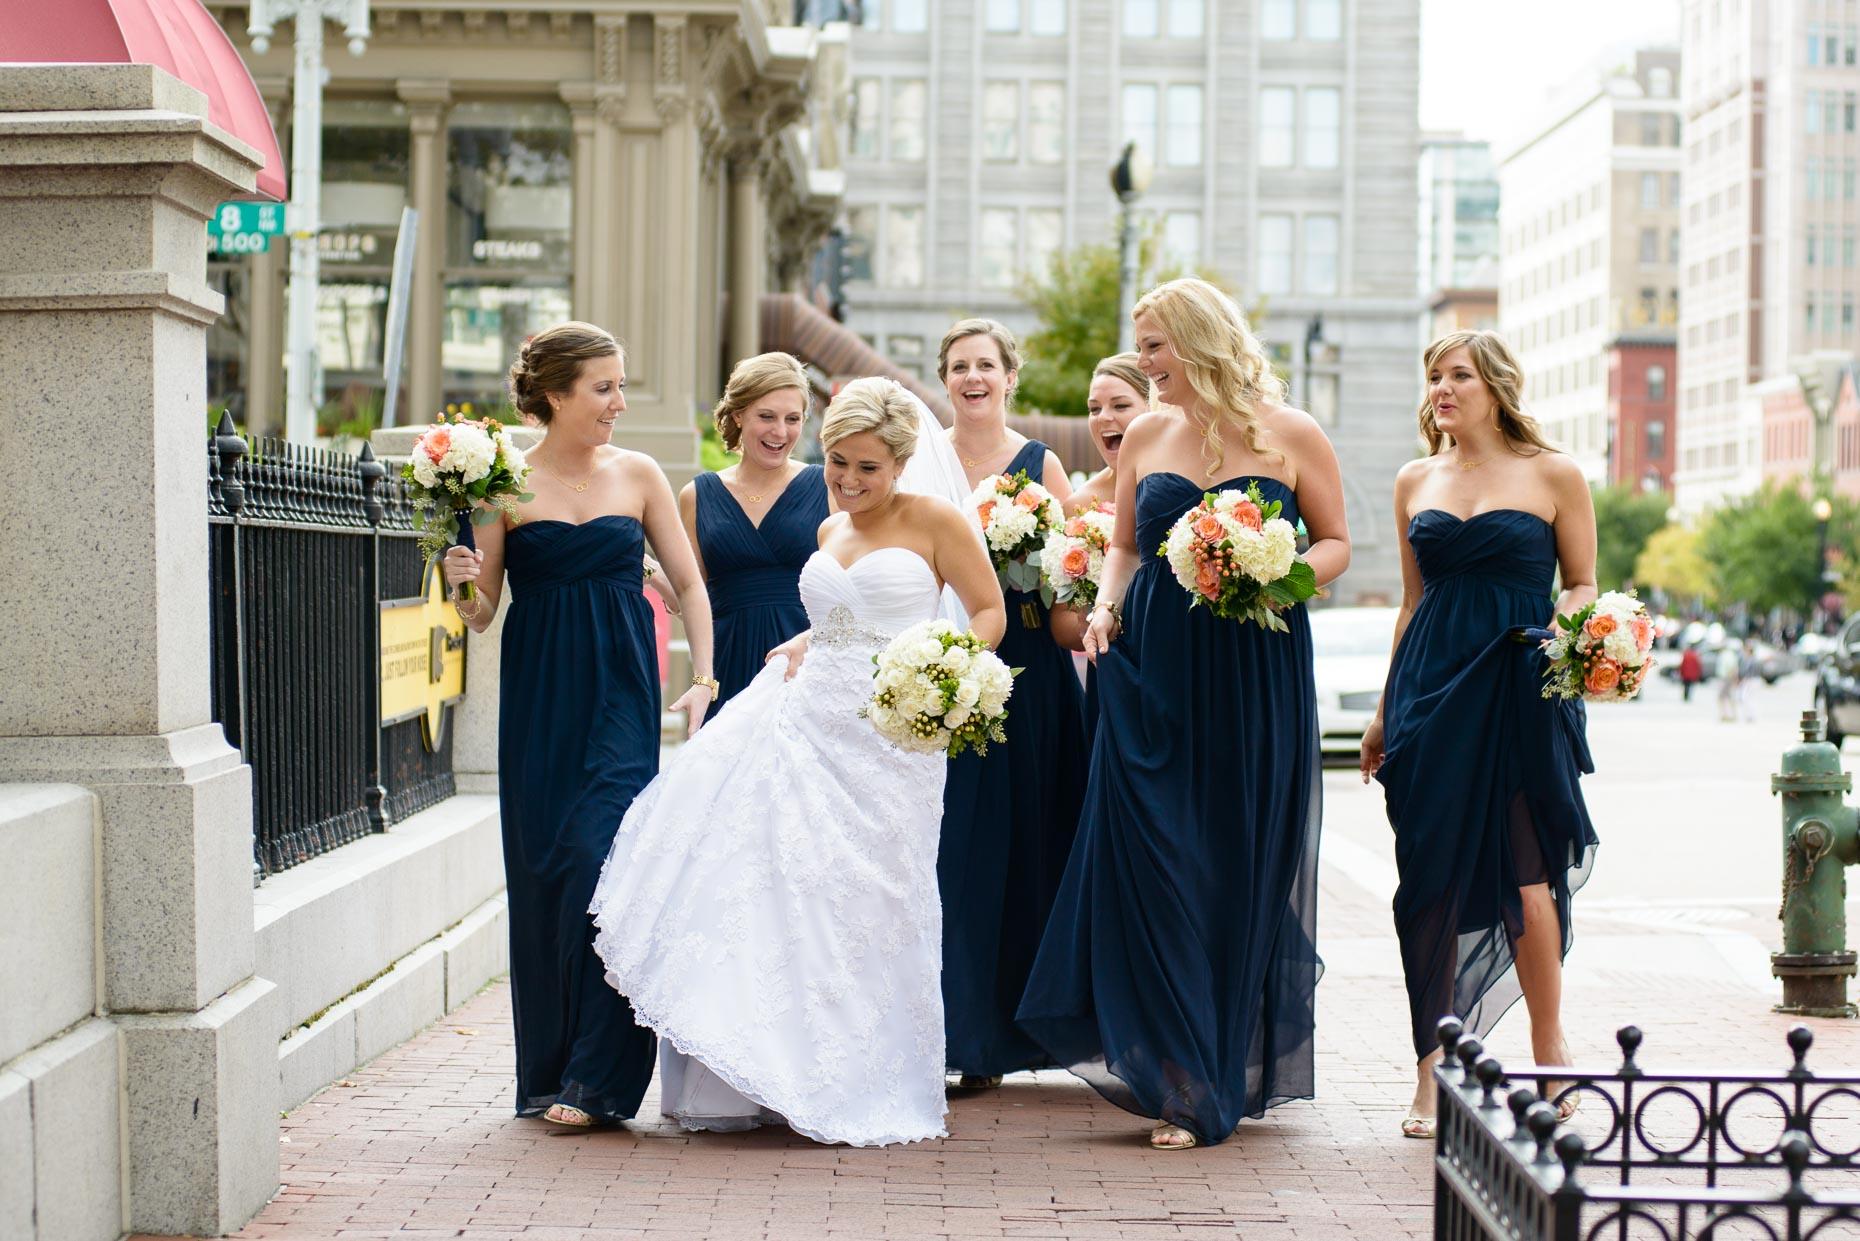 Weddings by Elliott O'Donovan - Washington DC_-24.jpg